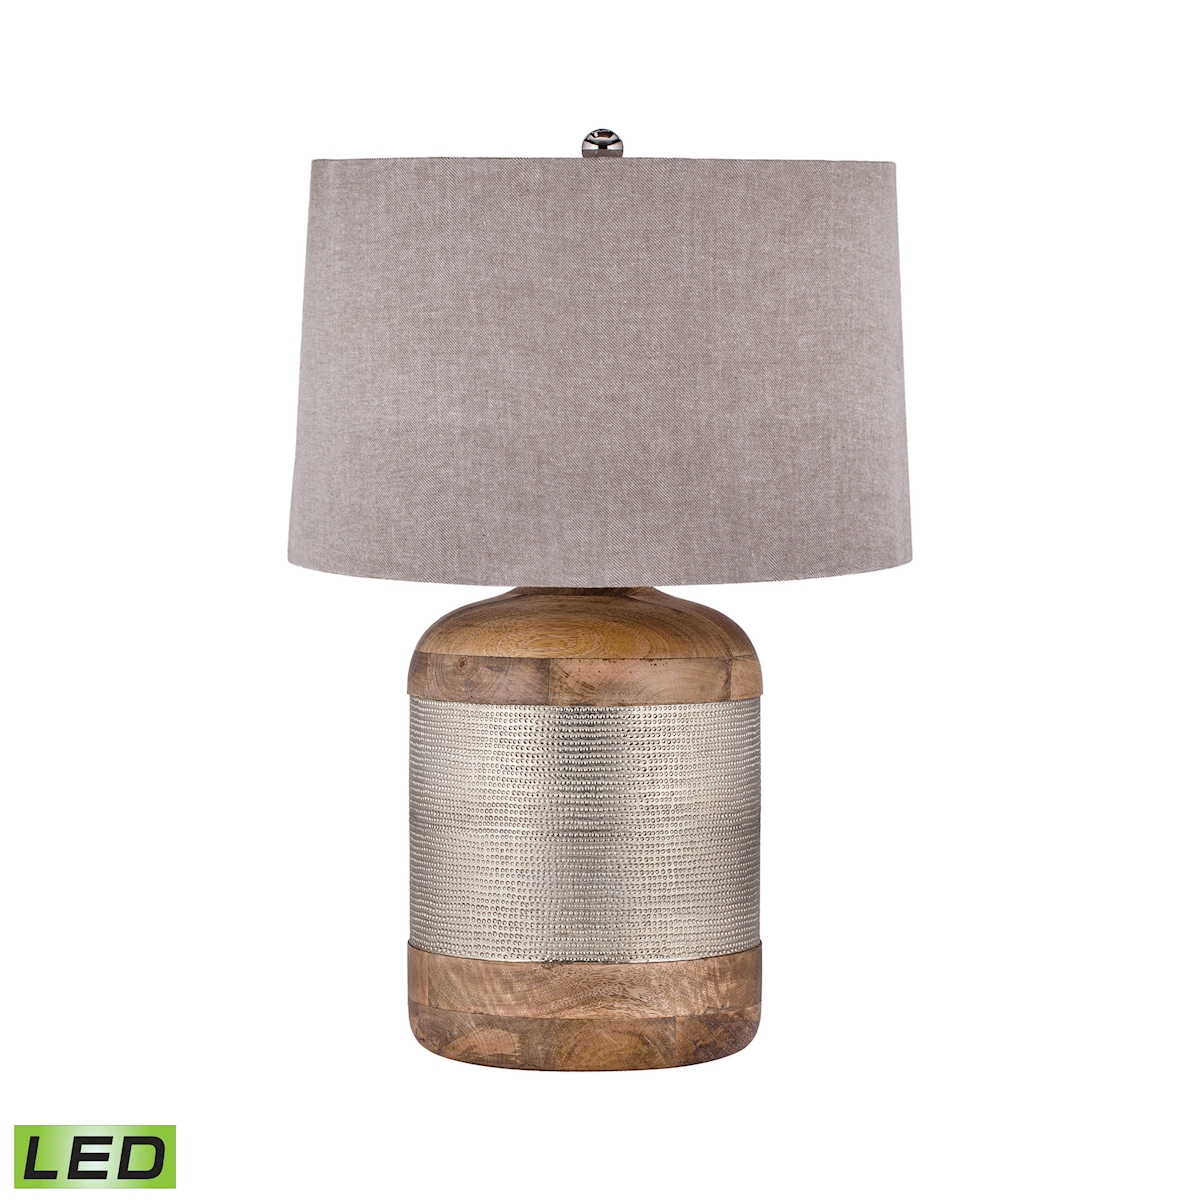 German Silver Drum Table Lamp - LED